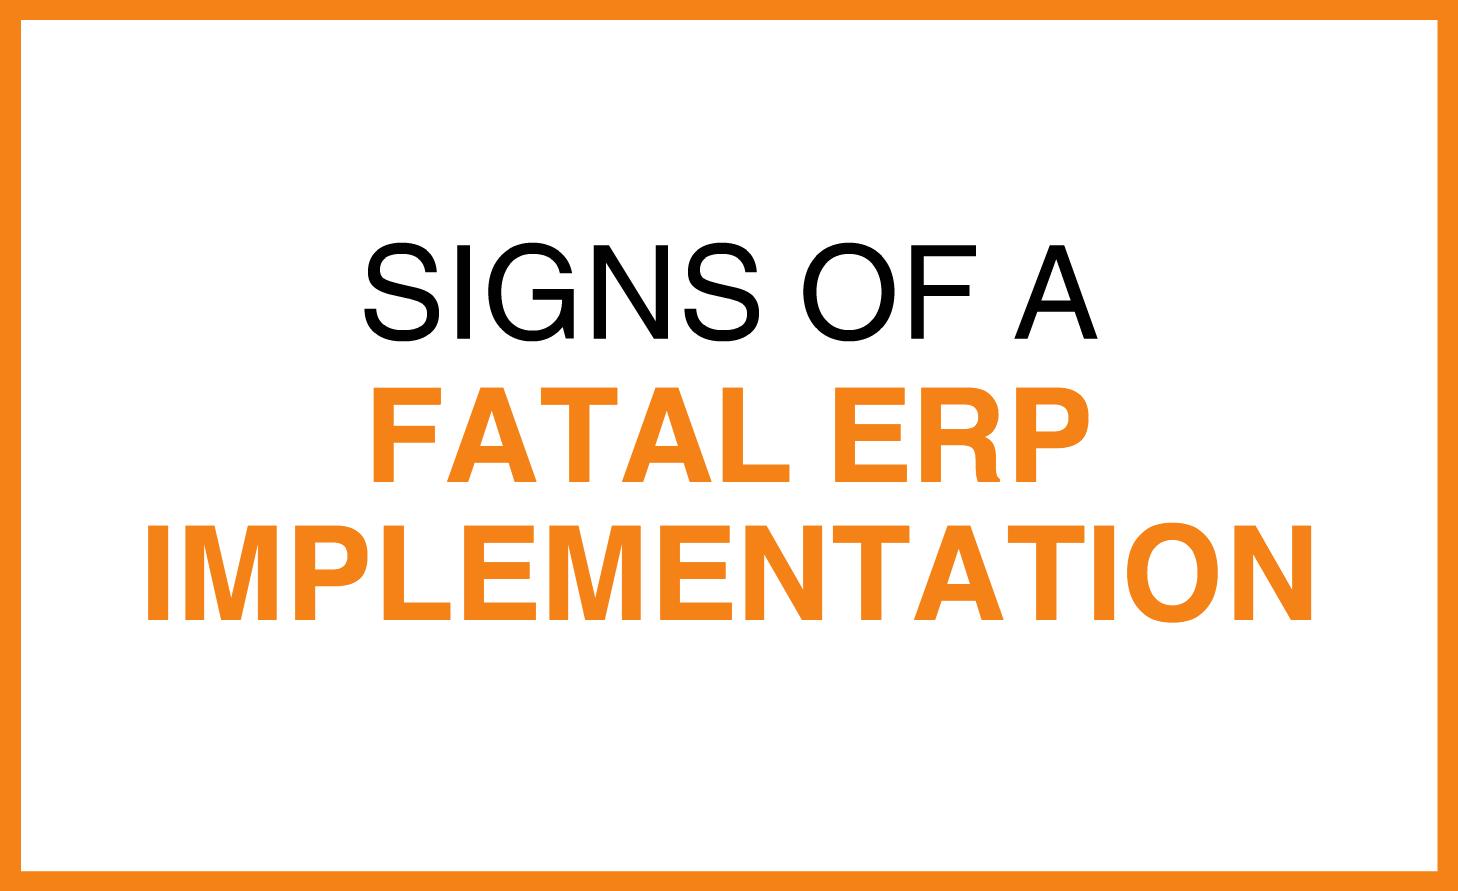 fatal erp implementation.png